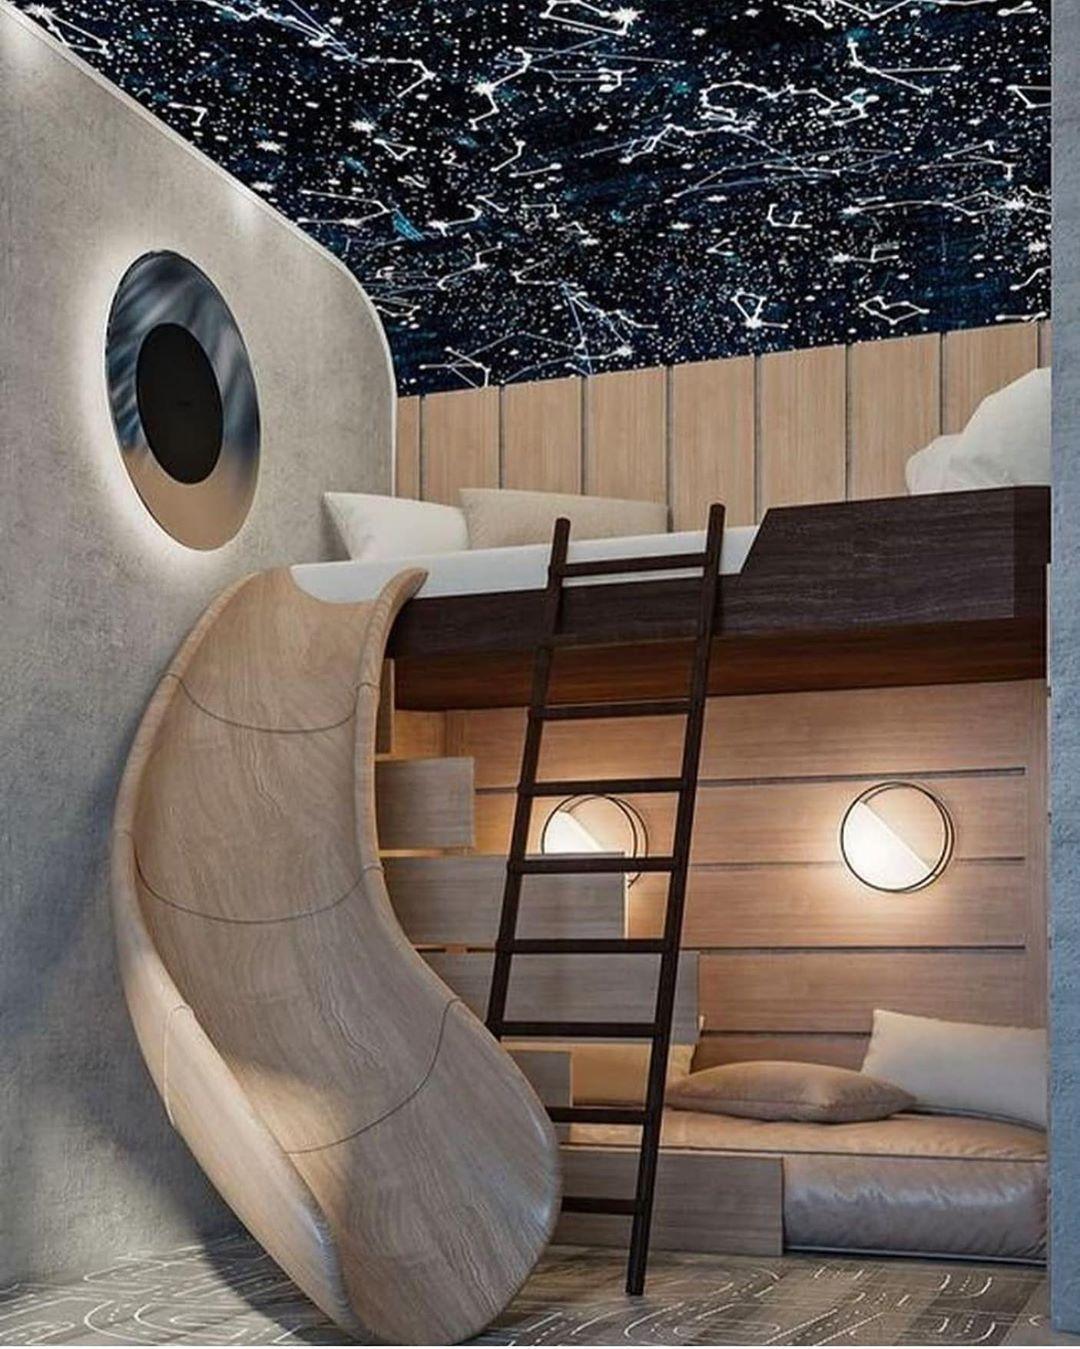 Loving this bunk room to ♾️ and beyond!! . . . Designer unknown. #bunkbed #bunkbeds #bunkroom #kidsroom #kidsbedroom #kidsbedroomdecor #builtinbunks #girlsbedroom #boysbedroom #girlsbedroomdecor #boysbedroomdecor #kidsroom #kidsbedroomdecor #kidsrooms #luxuryhome #luxuryhomes #architecturephotography #architecture #mansion #luxuryhomedesign #homearchitecture #homesweethome  #Regram via @bedrooms_of_insta